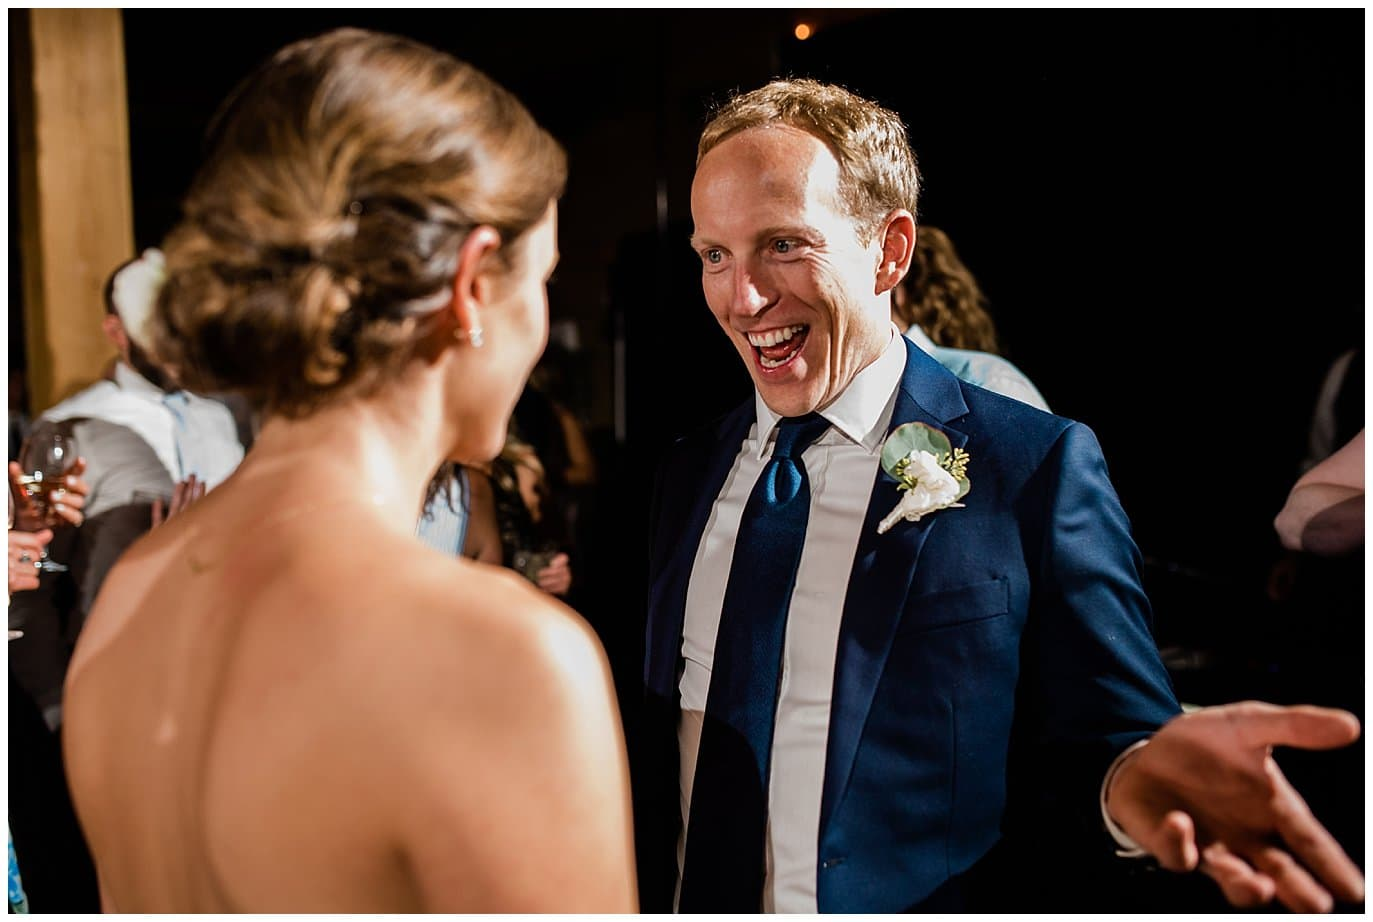 groom and bride dancing at Arapahoe Basin Black Mountain Lodge Wedding by Arapahoe Basin Wedding Photographer Jennie Crate